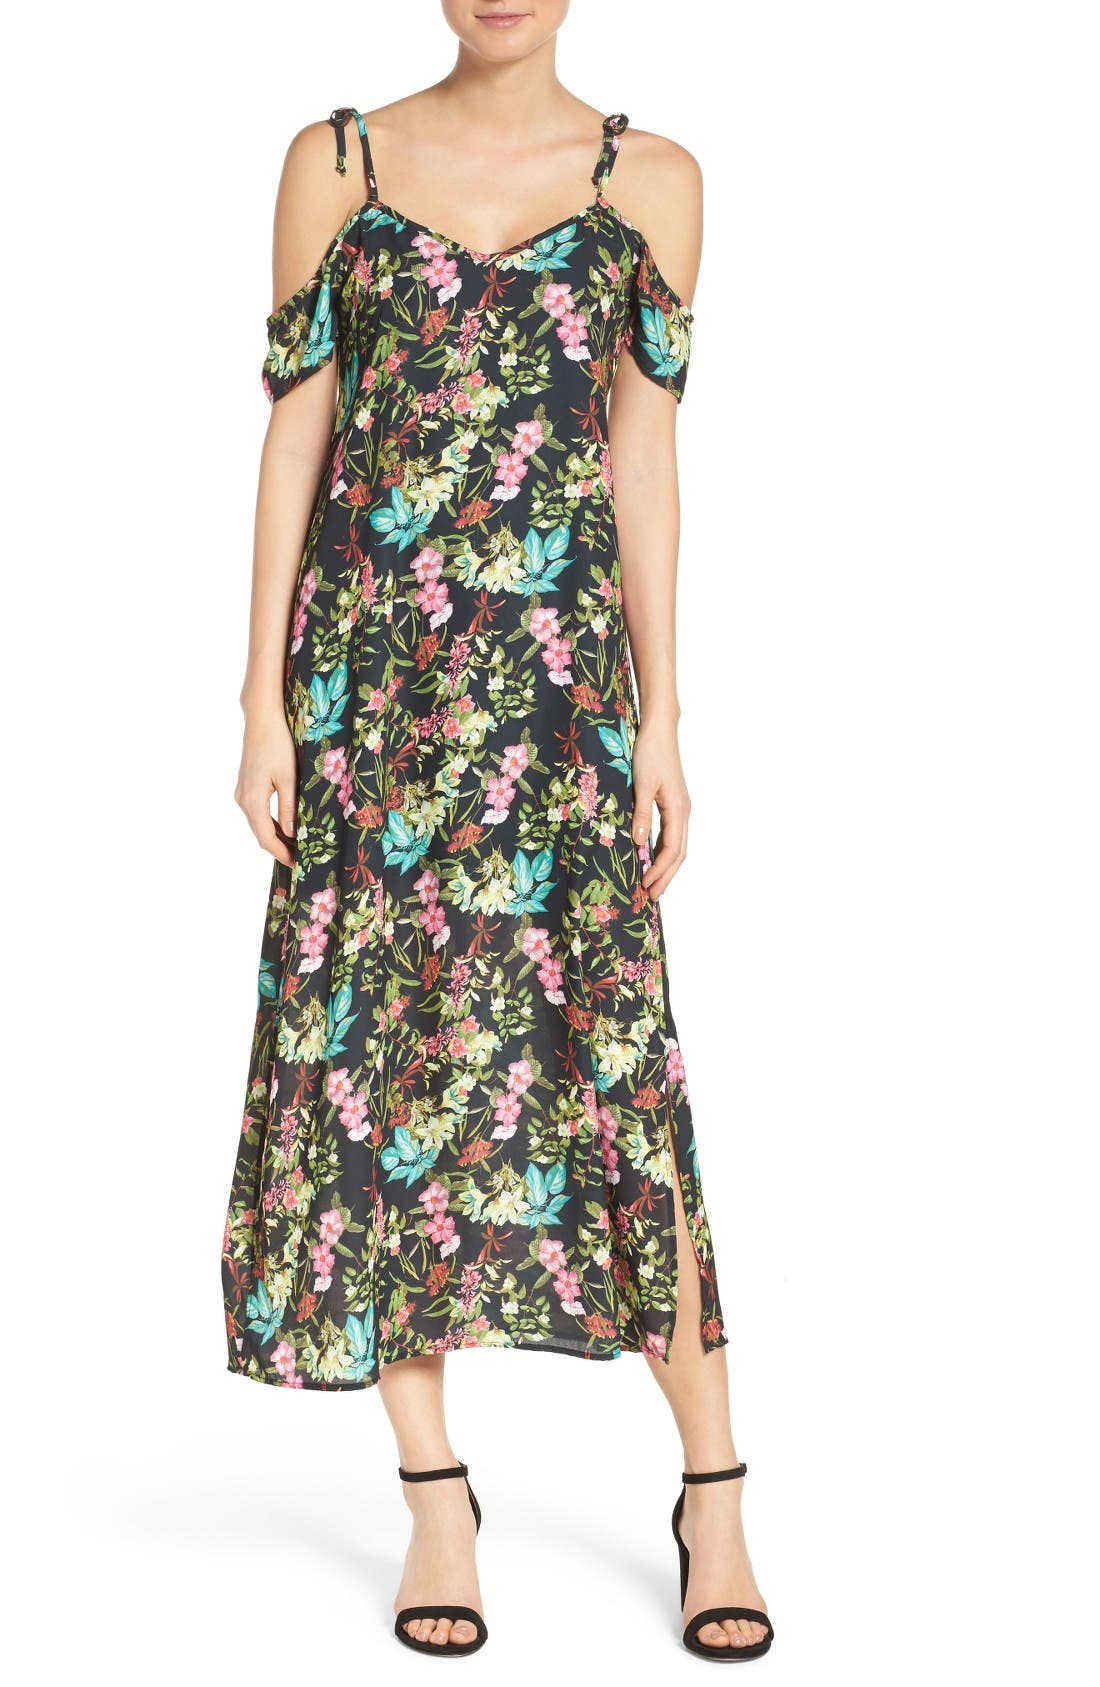 NSR Tie Cold Shoulder Midi Dress